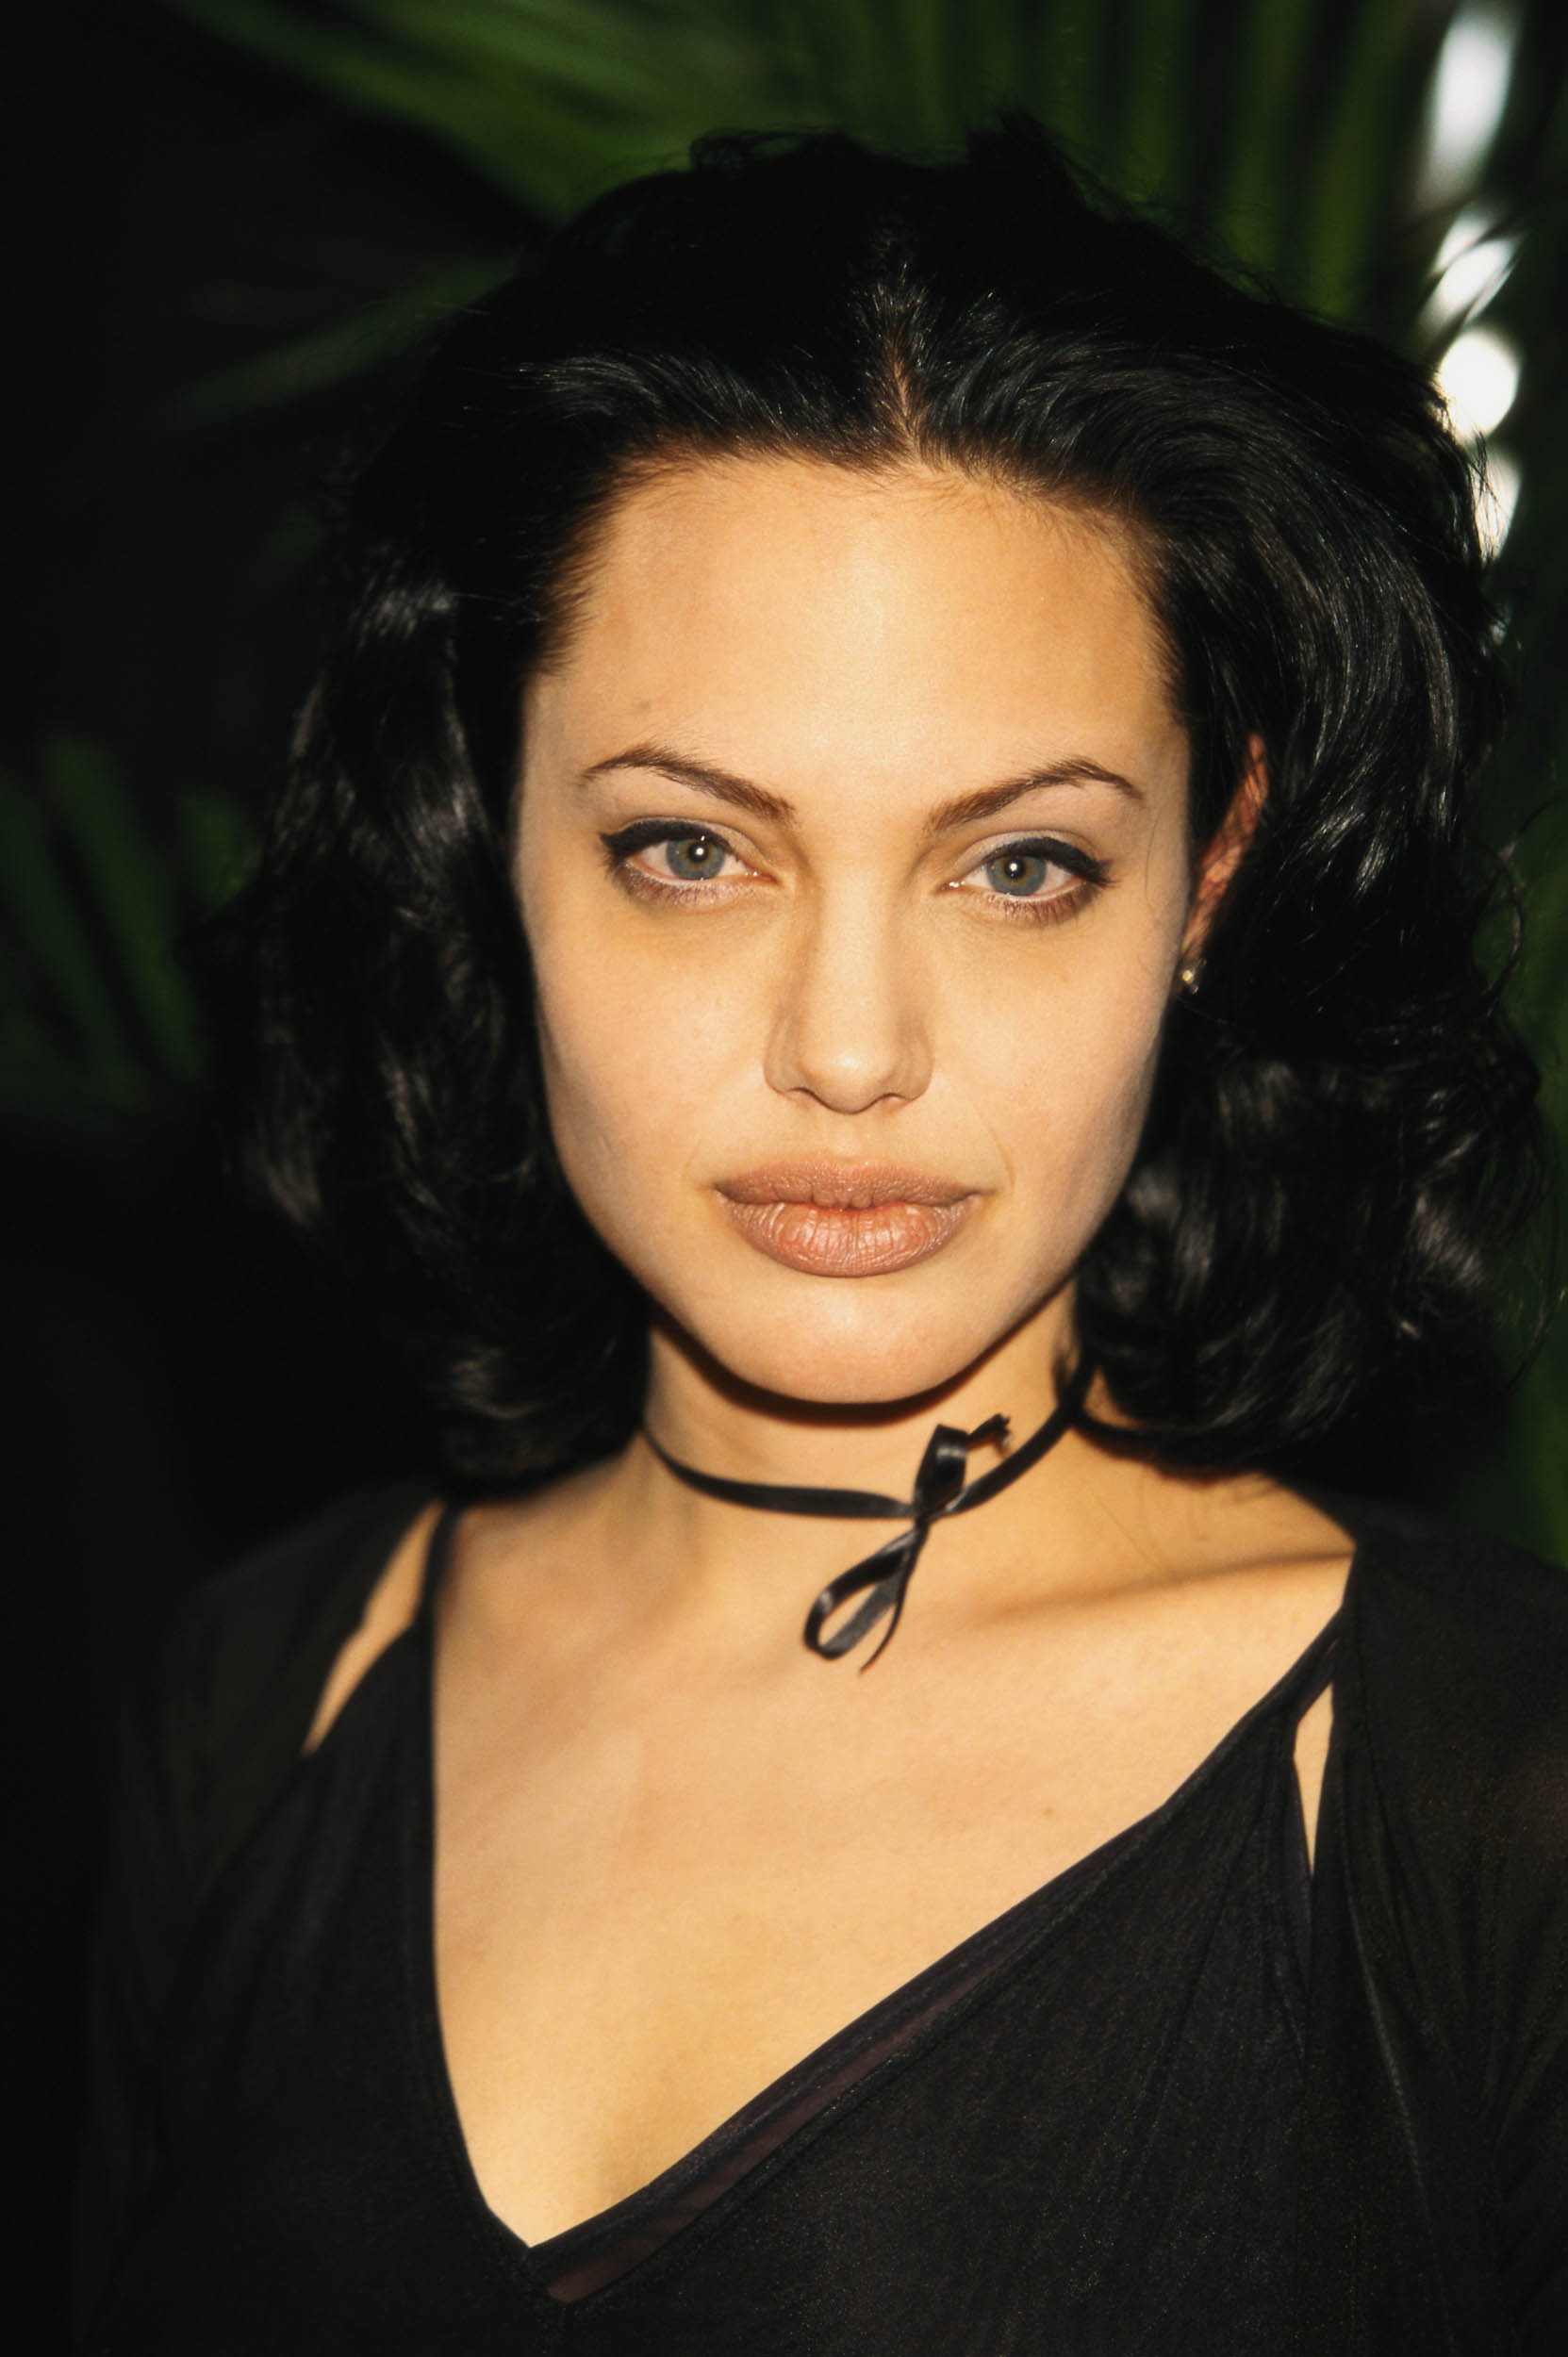 Angelina Jolie photo 730 of 3430 pics, wallpaper - photo ... Angelina Jolie S Kids